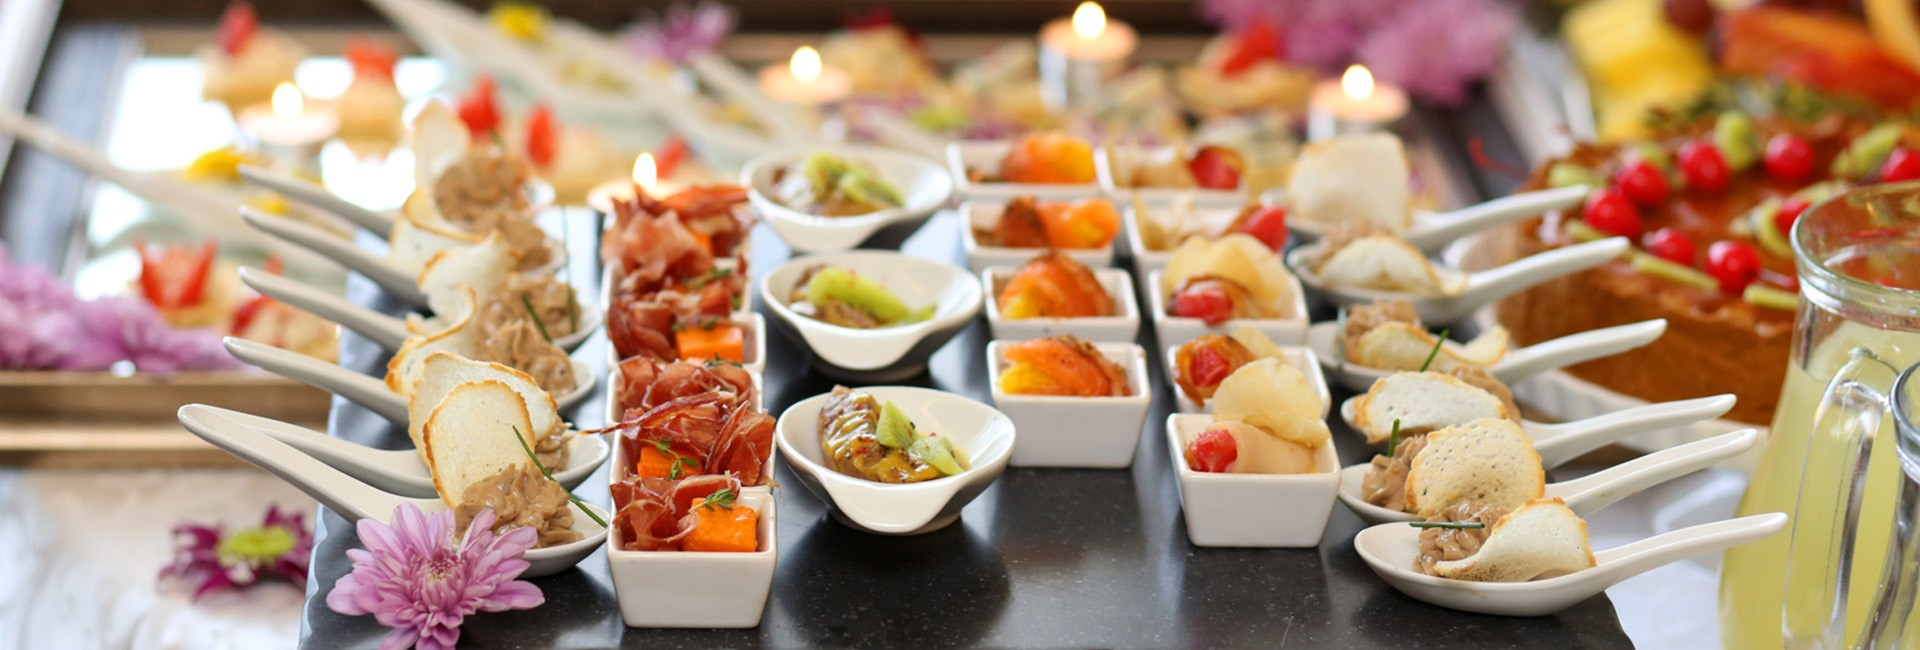 Marbella Gourmet